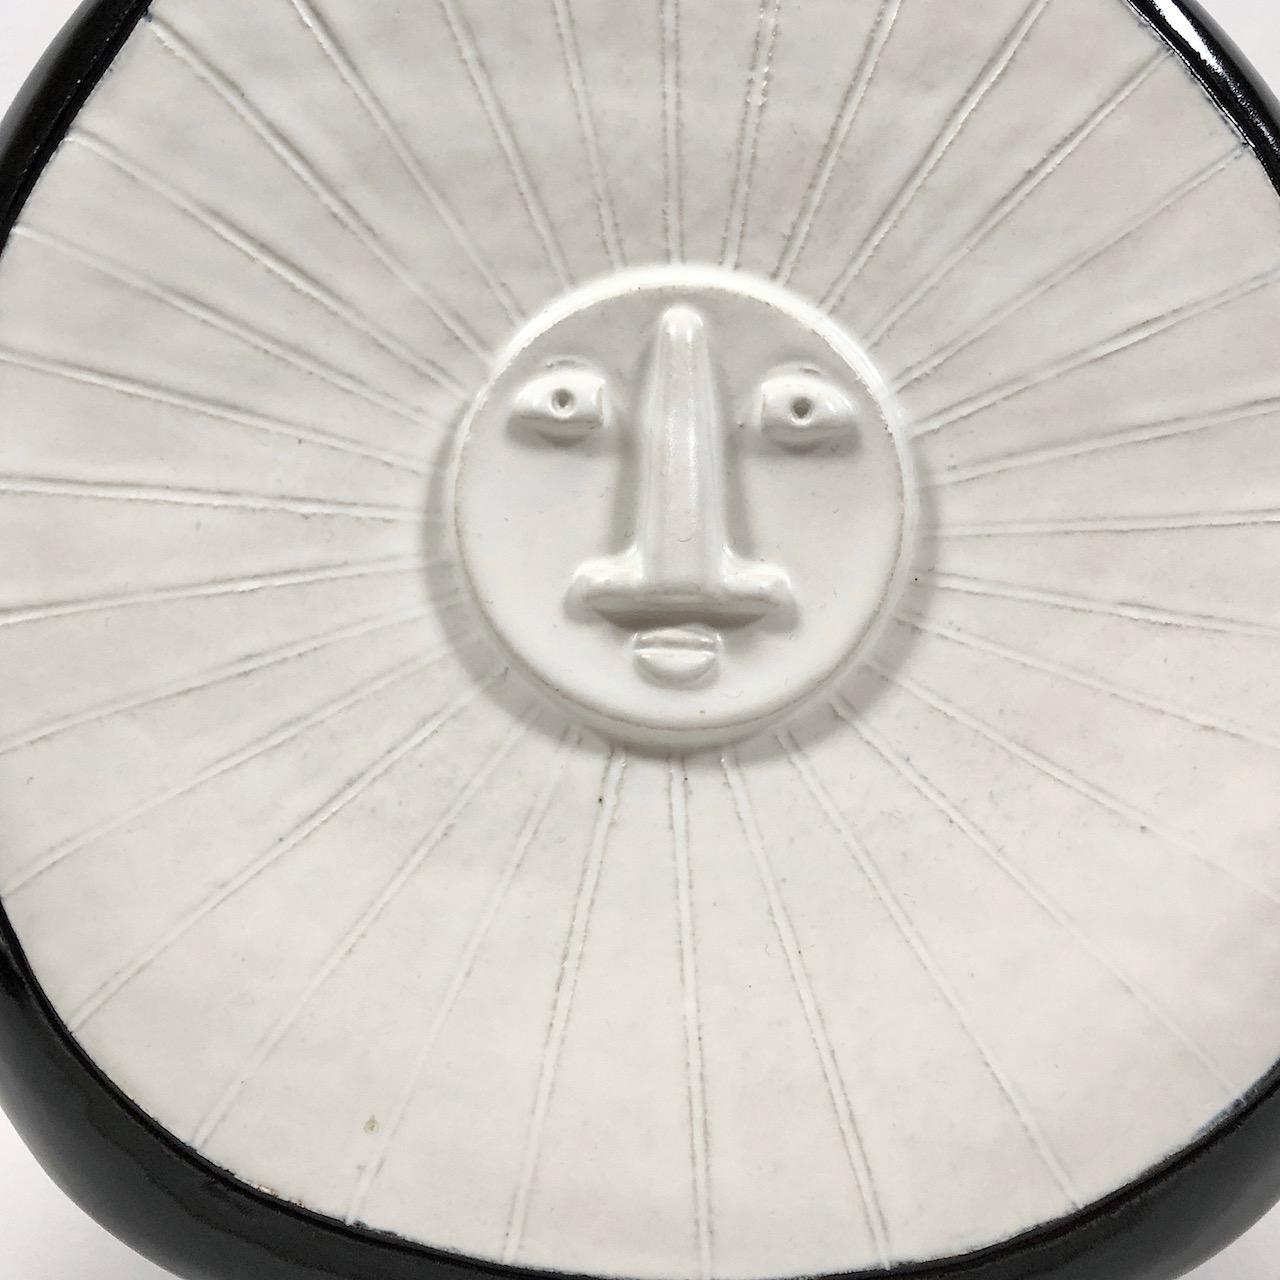 DaLo - Black and White Ceramic Table Lamp Base